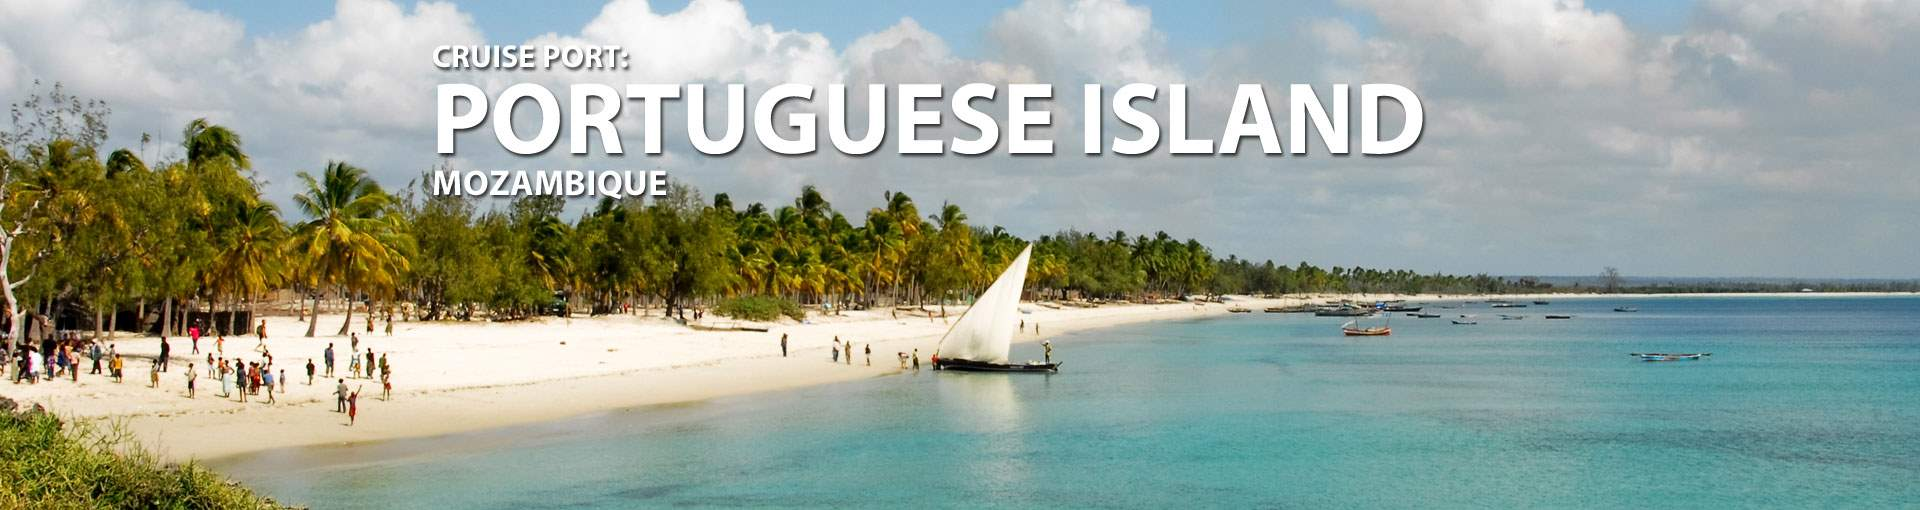 Cruises to Portuguese Island, Mozambique